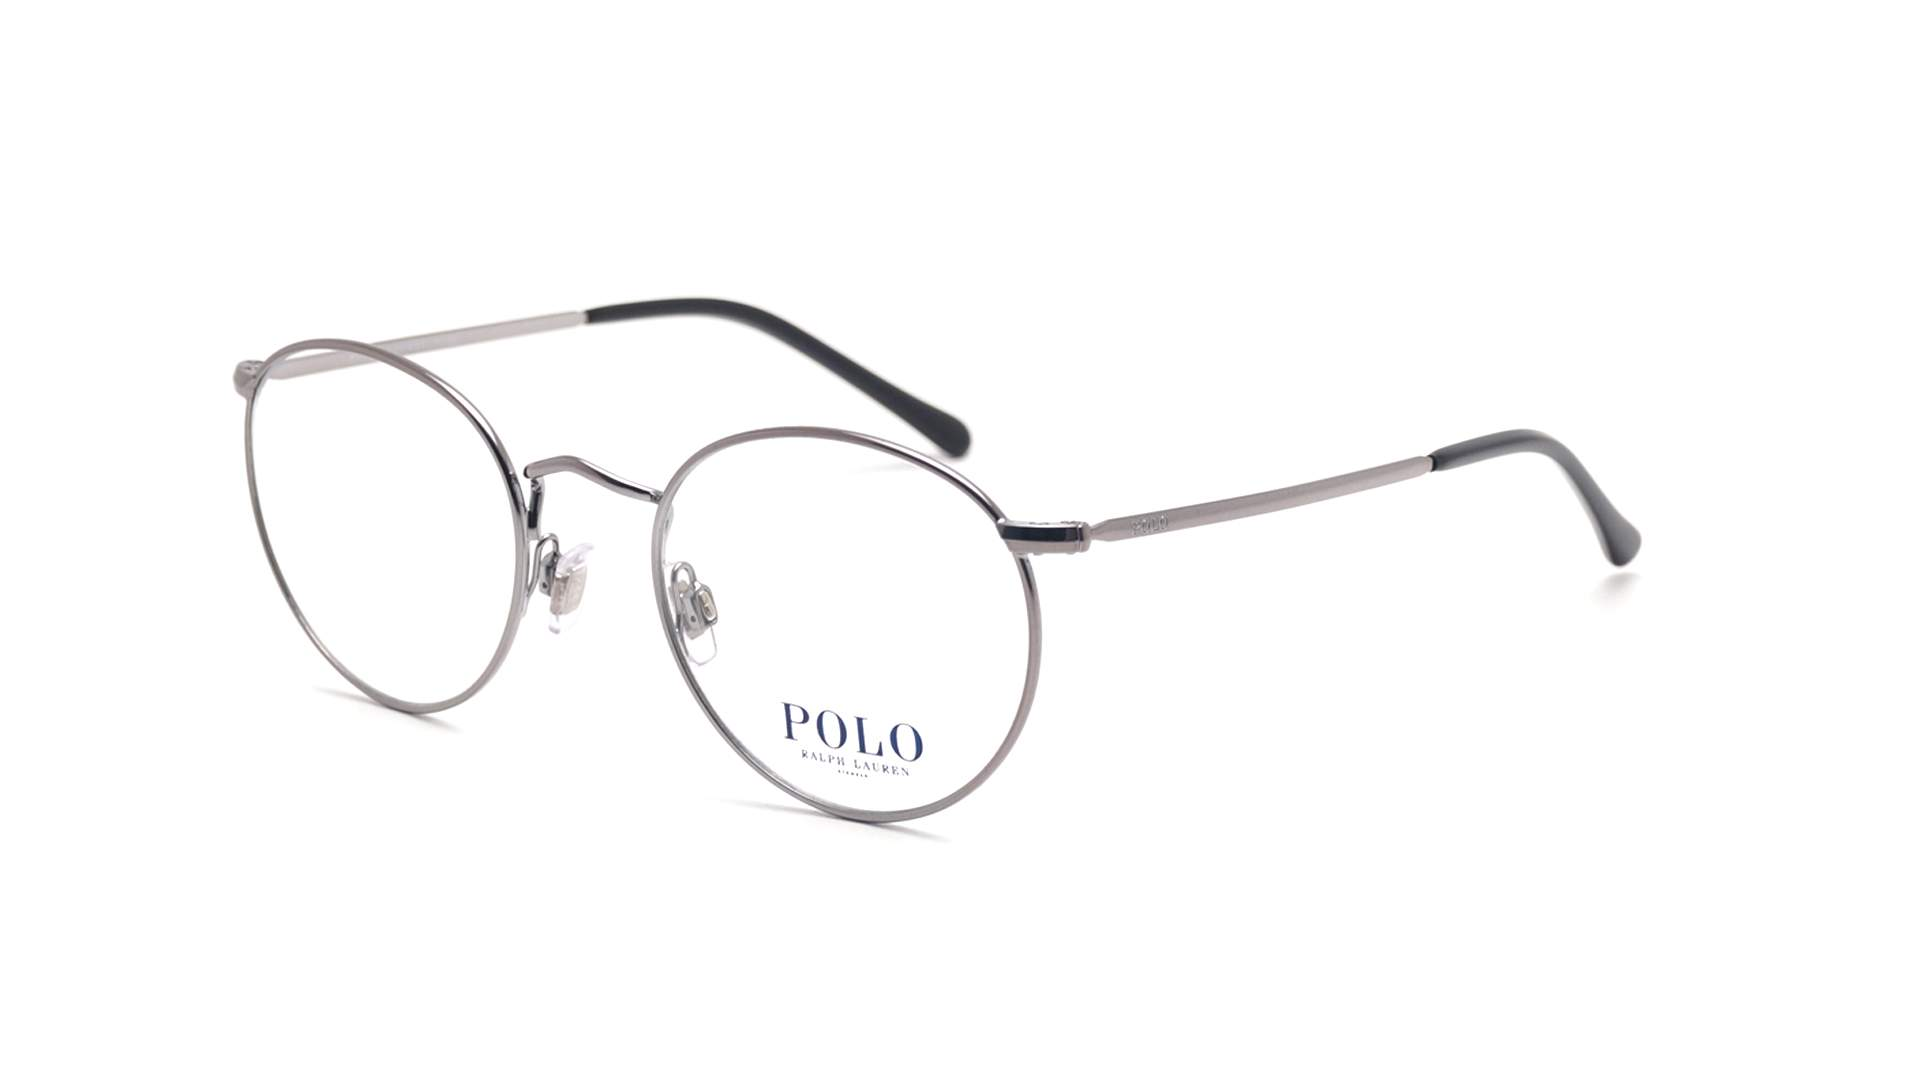 Polo Ralph Lauren Ph 48 20 Argent